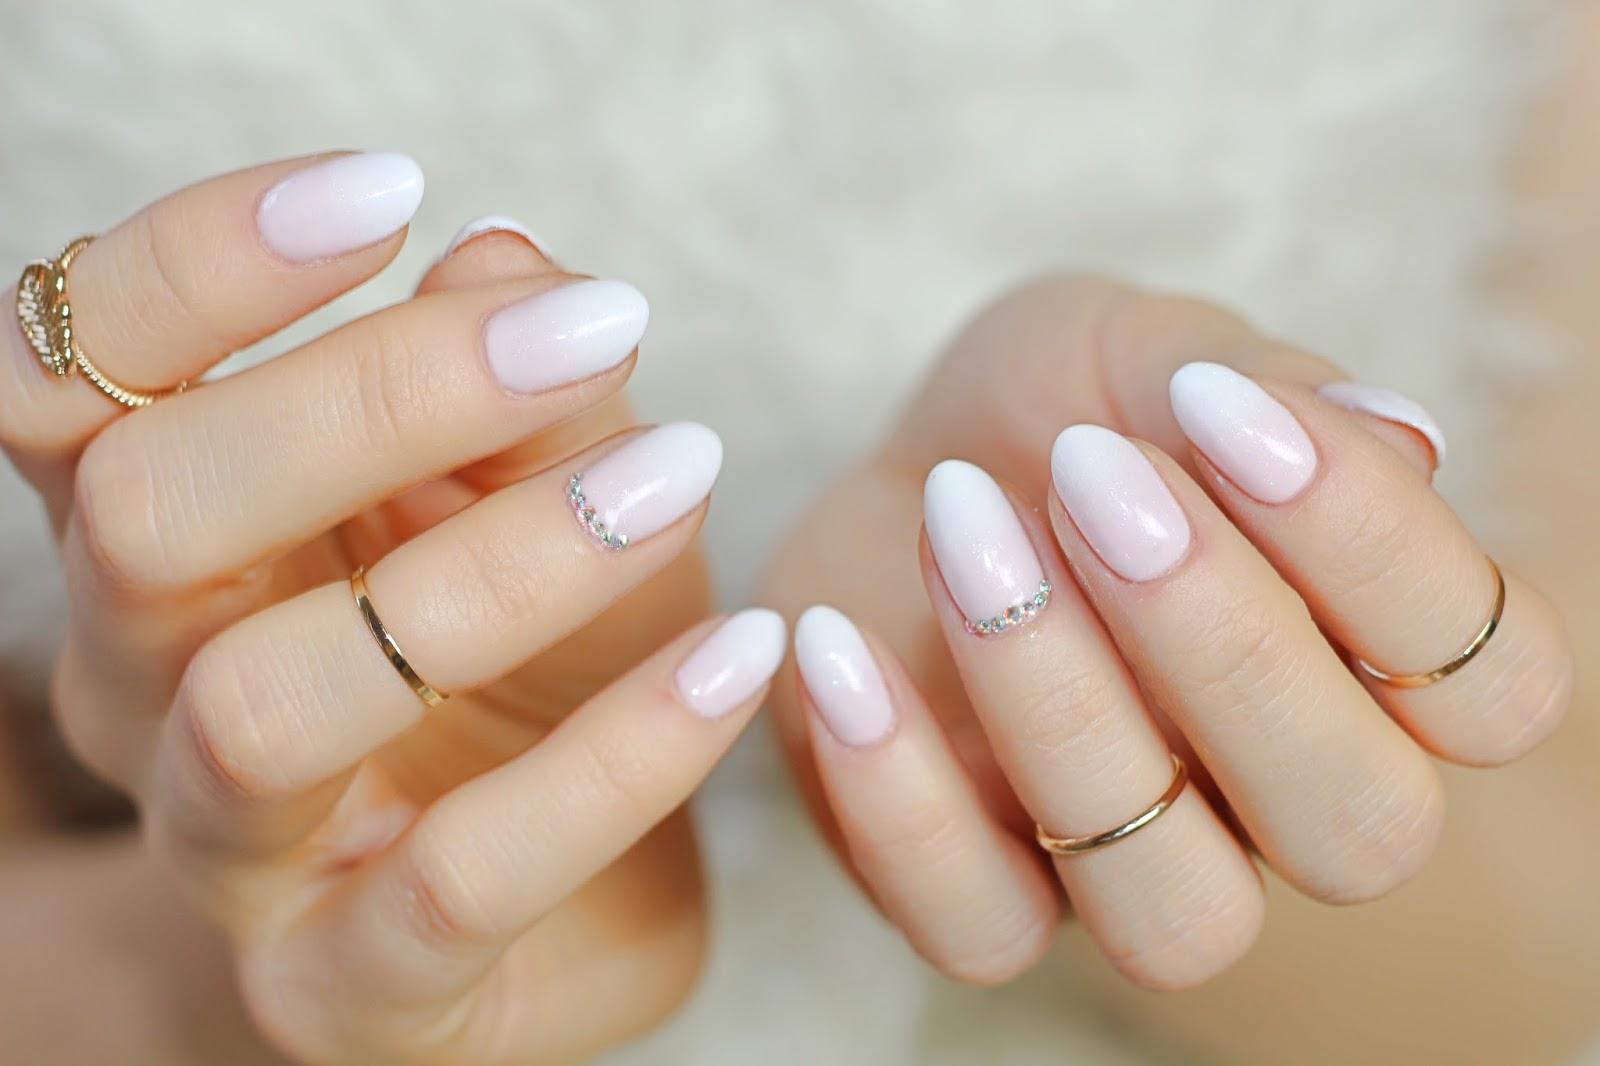 Manicure Time łatwy Sposób Na Babyboomer Minimalna